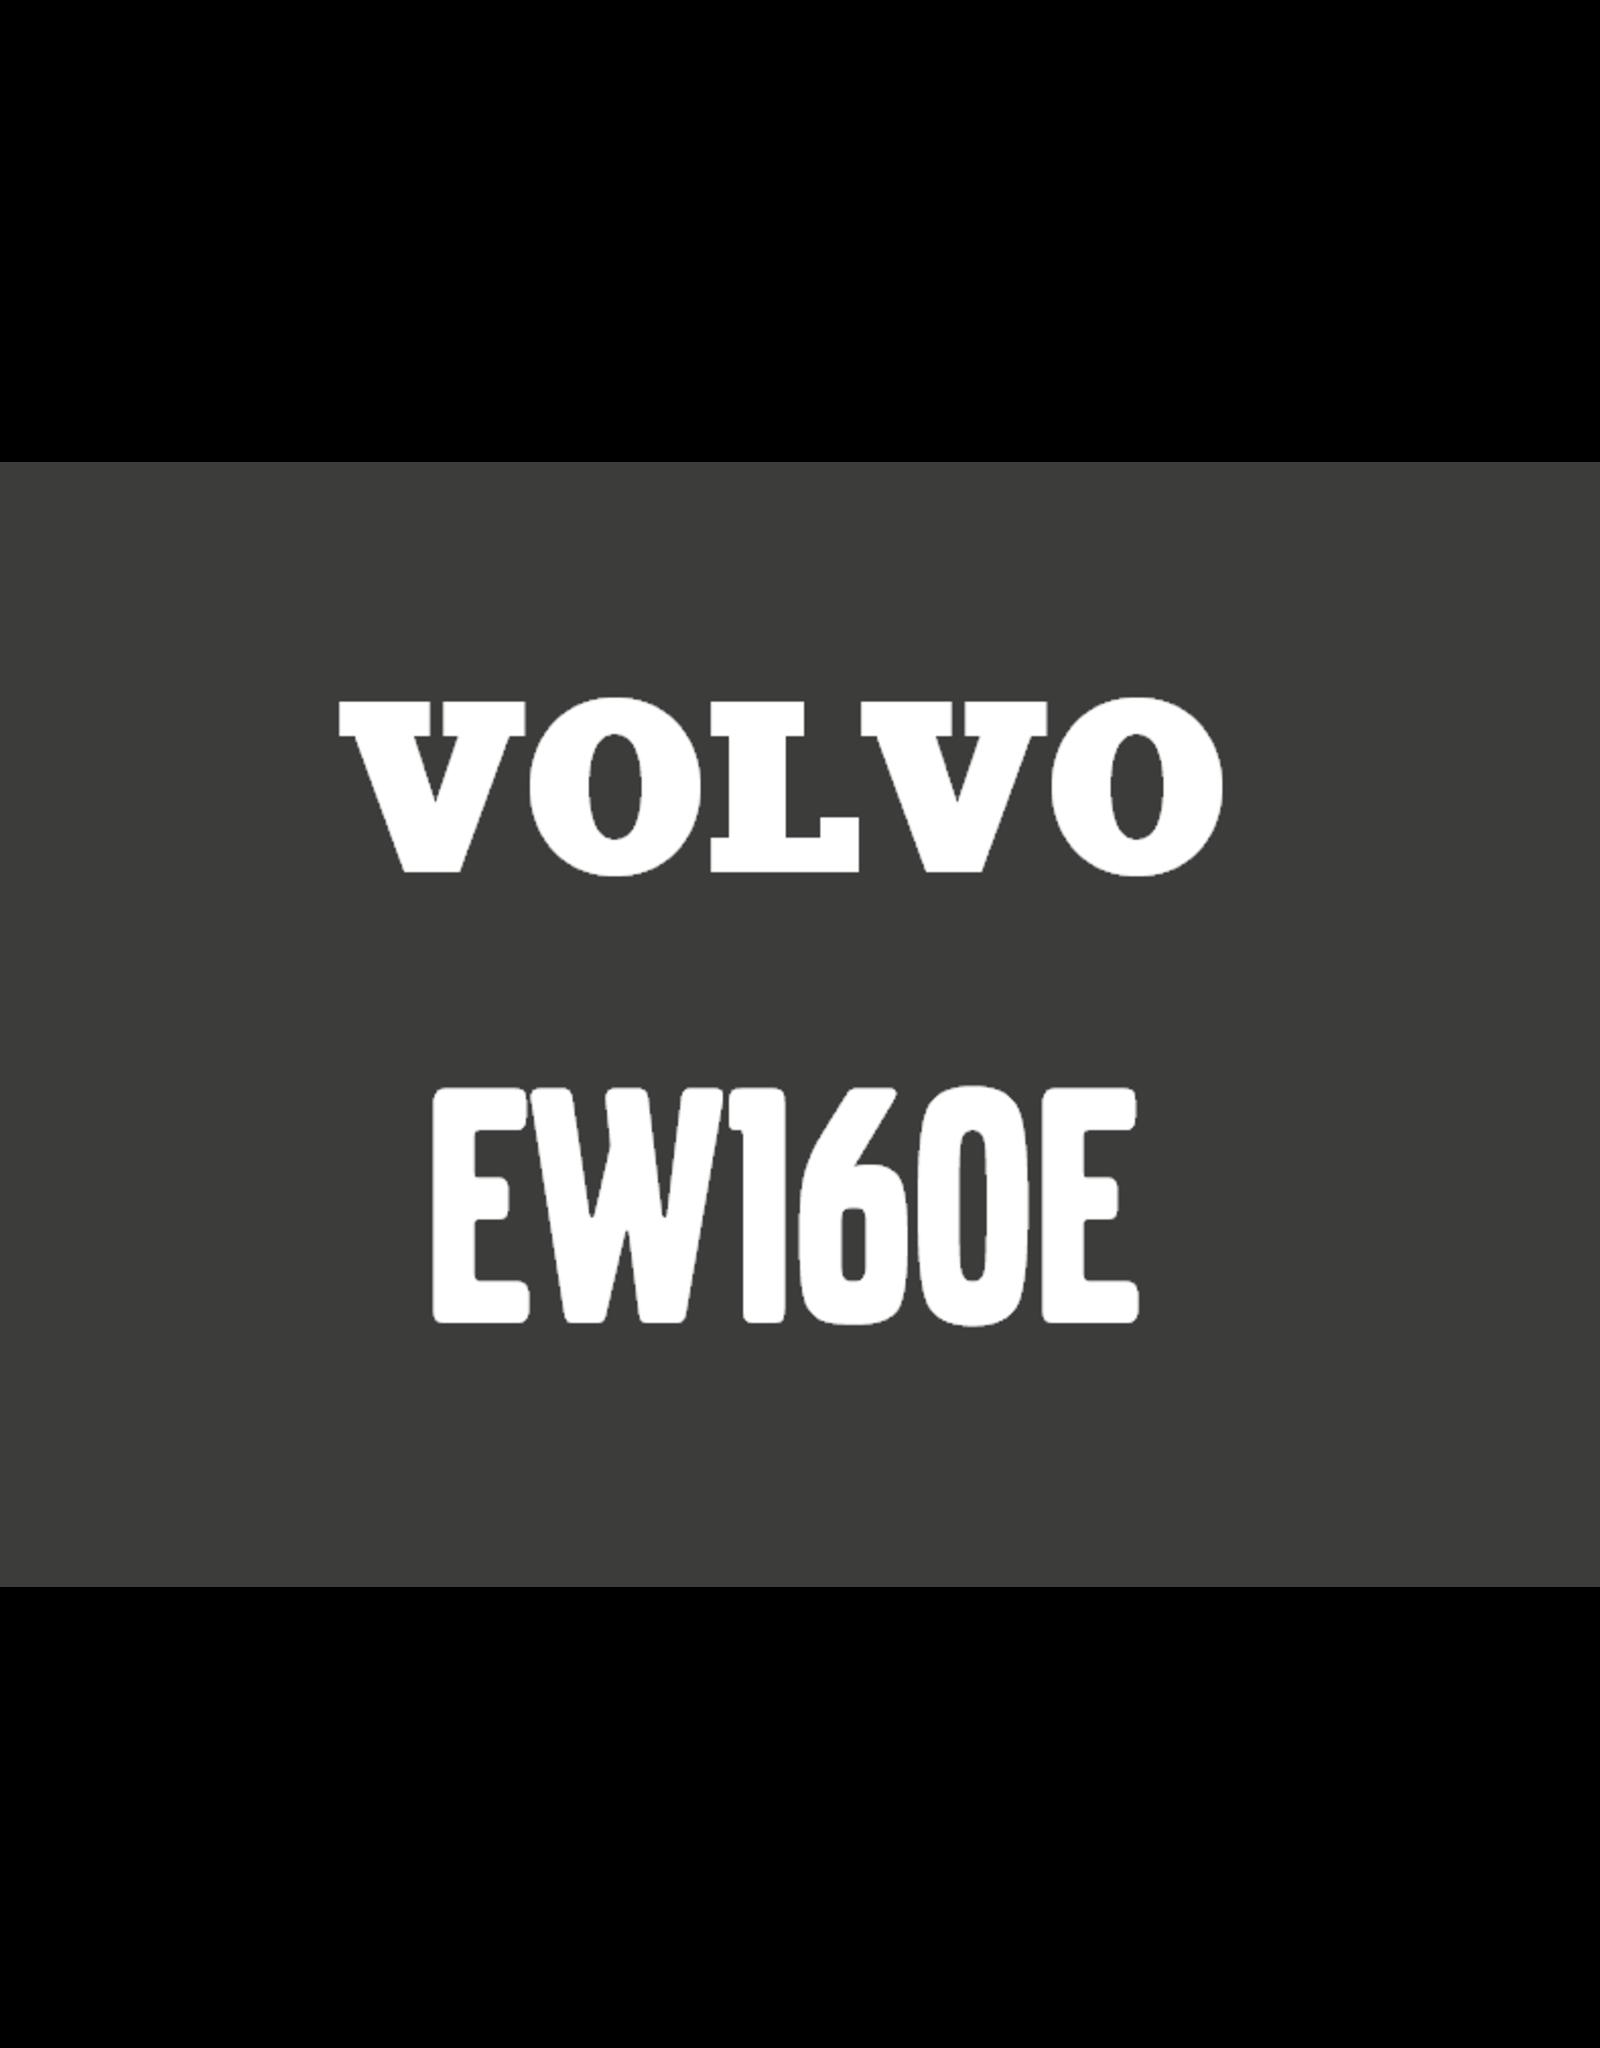 Echle Hartstahl GmbH FOPS for Volvo EW160E